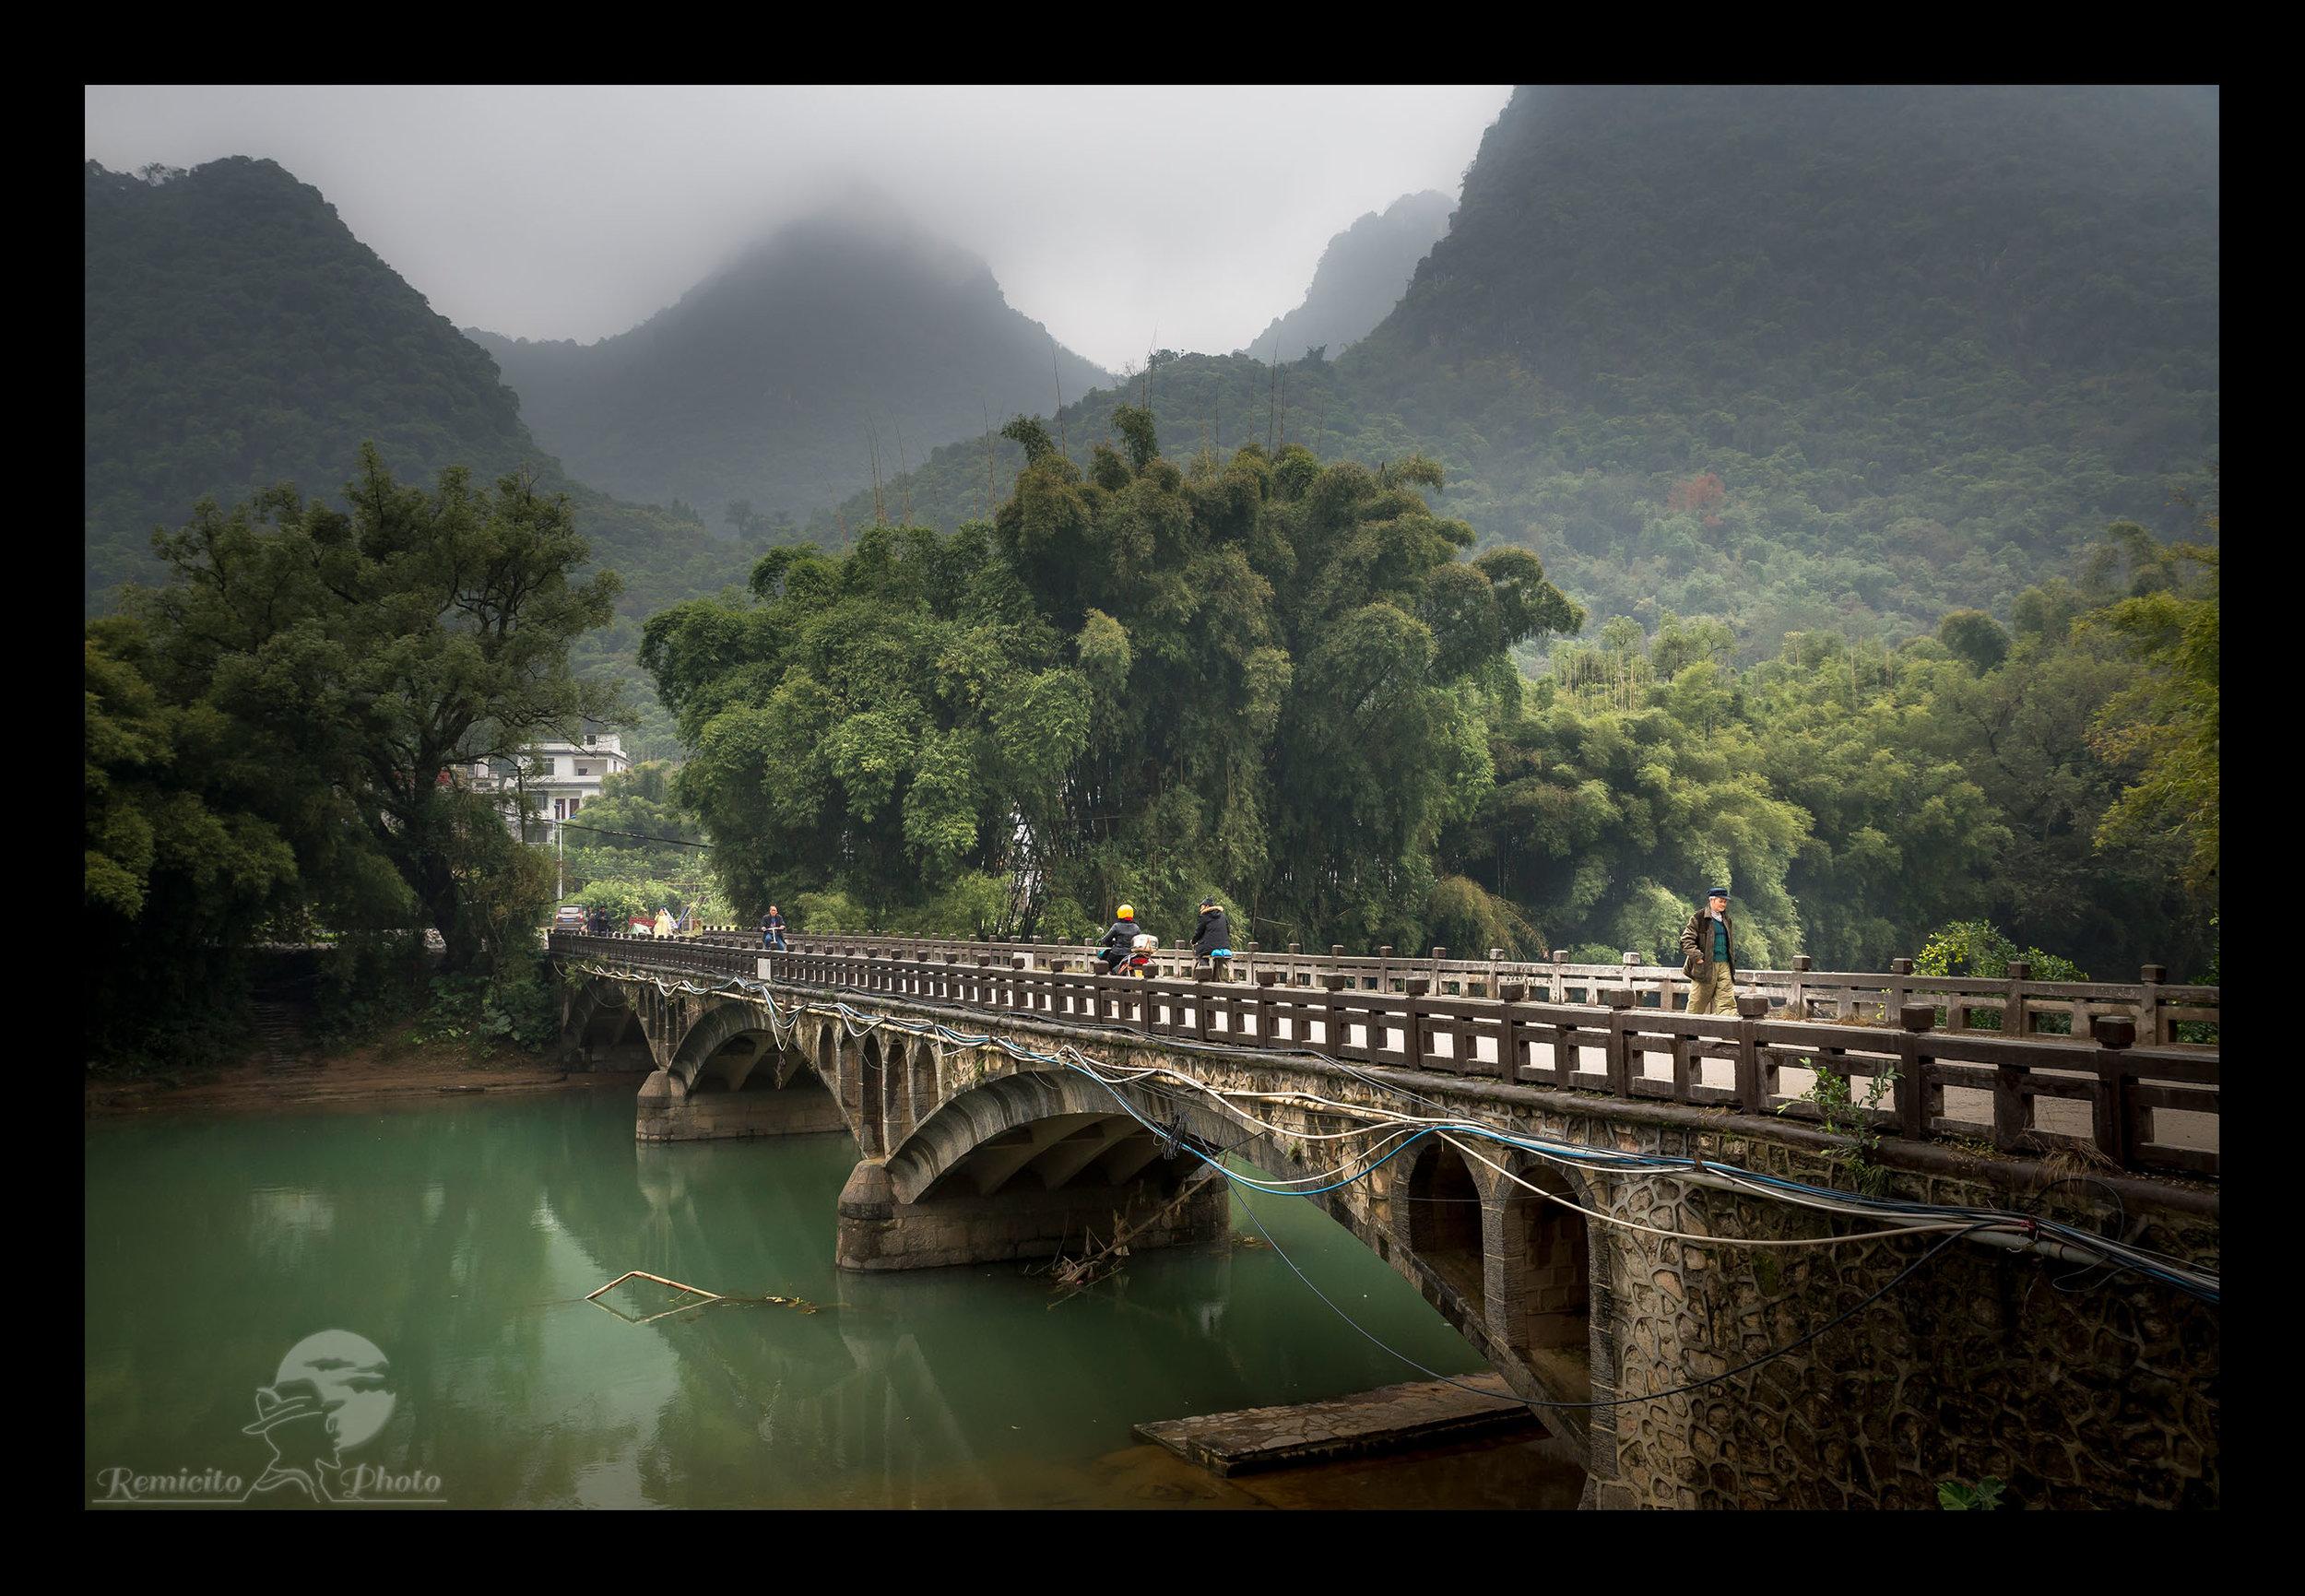 Photo Chine, Photo China, Bridge photo, photo pont, acheter photo montagne, idée cadeau photo, offrir photo montagne, gift photo mountain, gift bridge, gift photo bridge, gift photo china, buy photo china